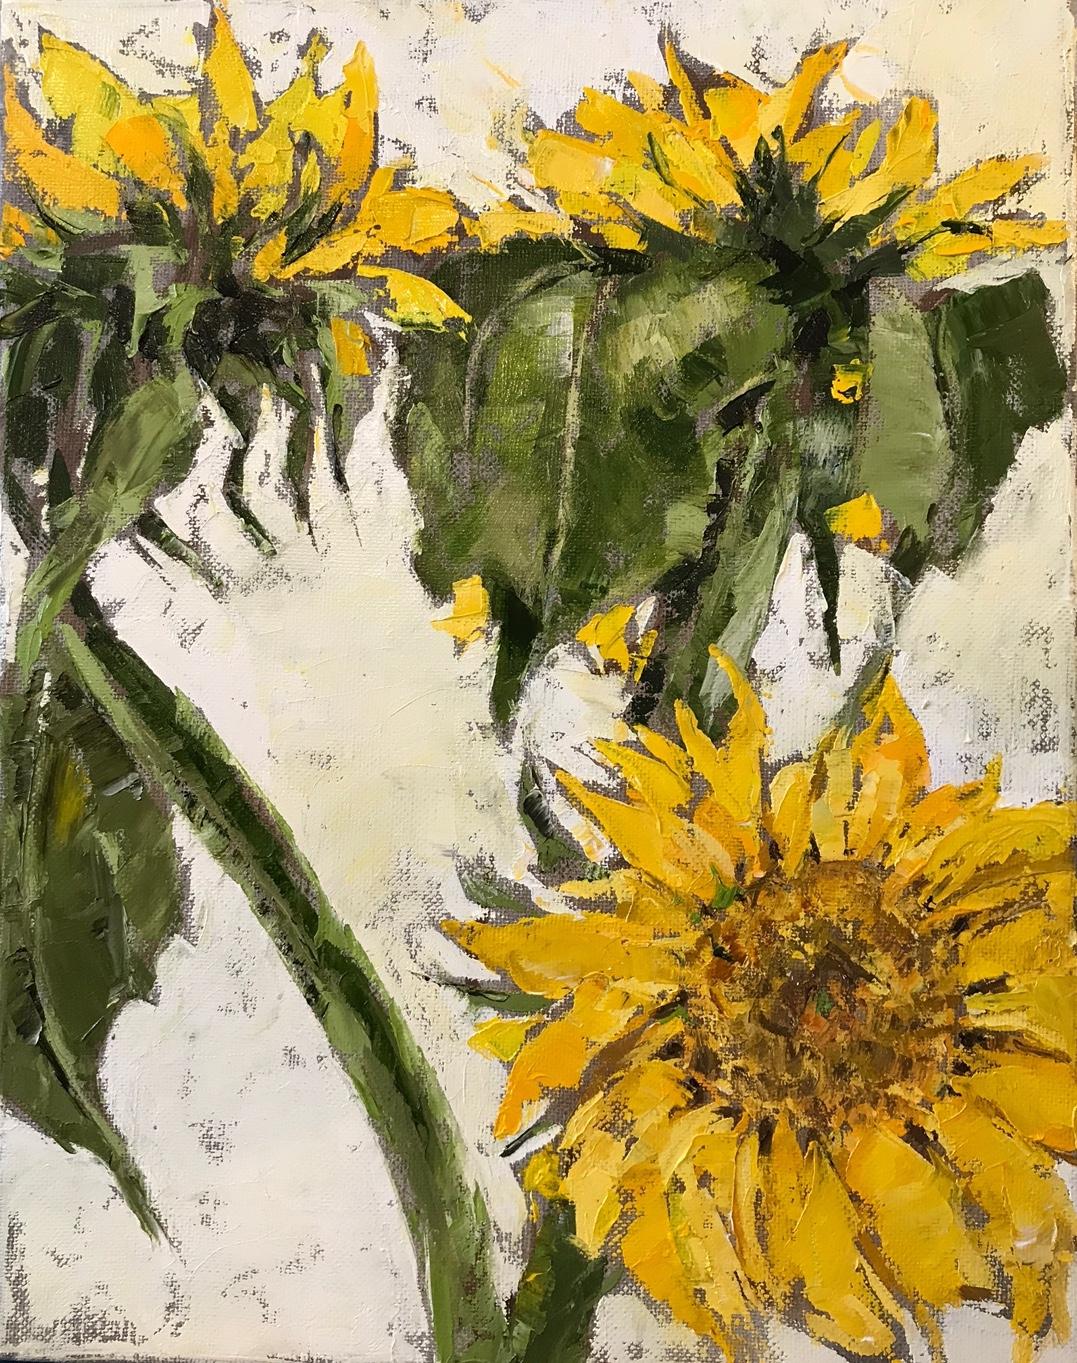 Sunflowers, oil on canvas, 16x12, $300